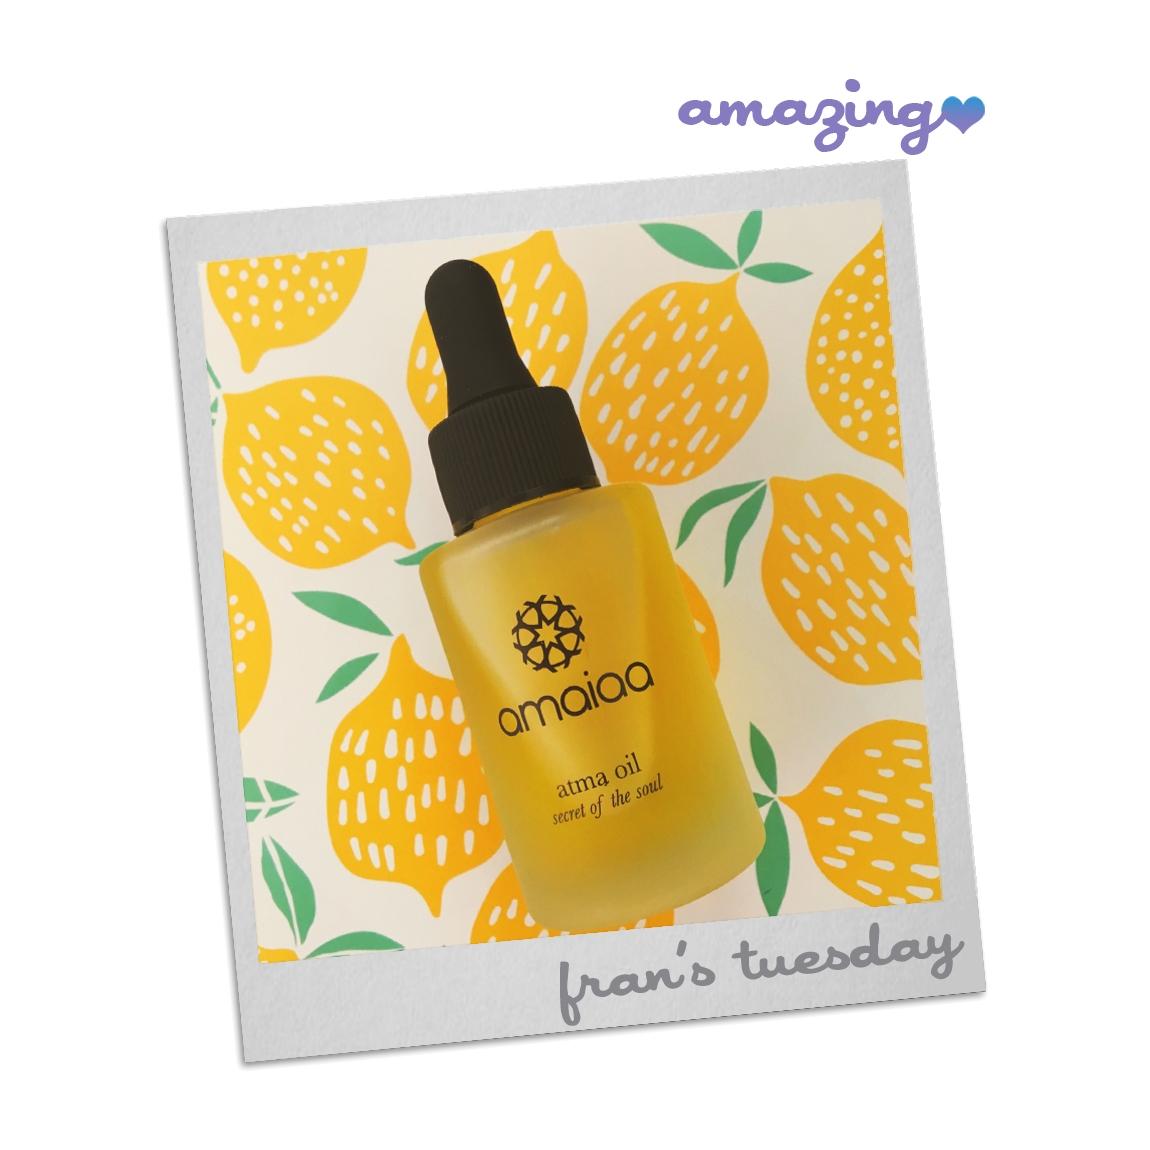 atma oil secrets of the soul & morning radiance facial elixir, atma face oil